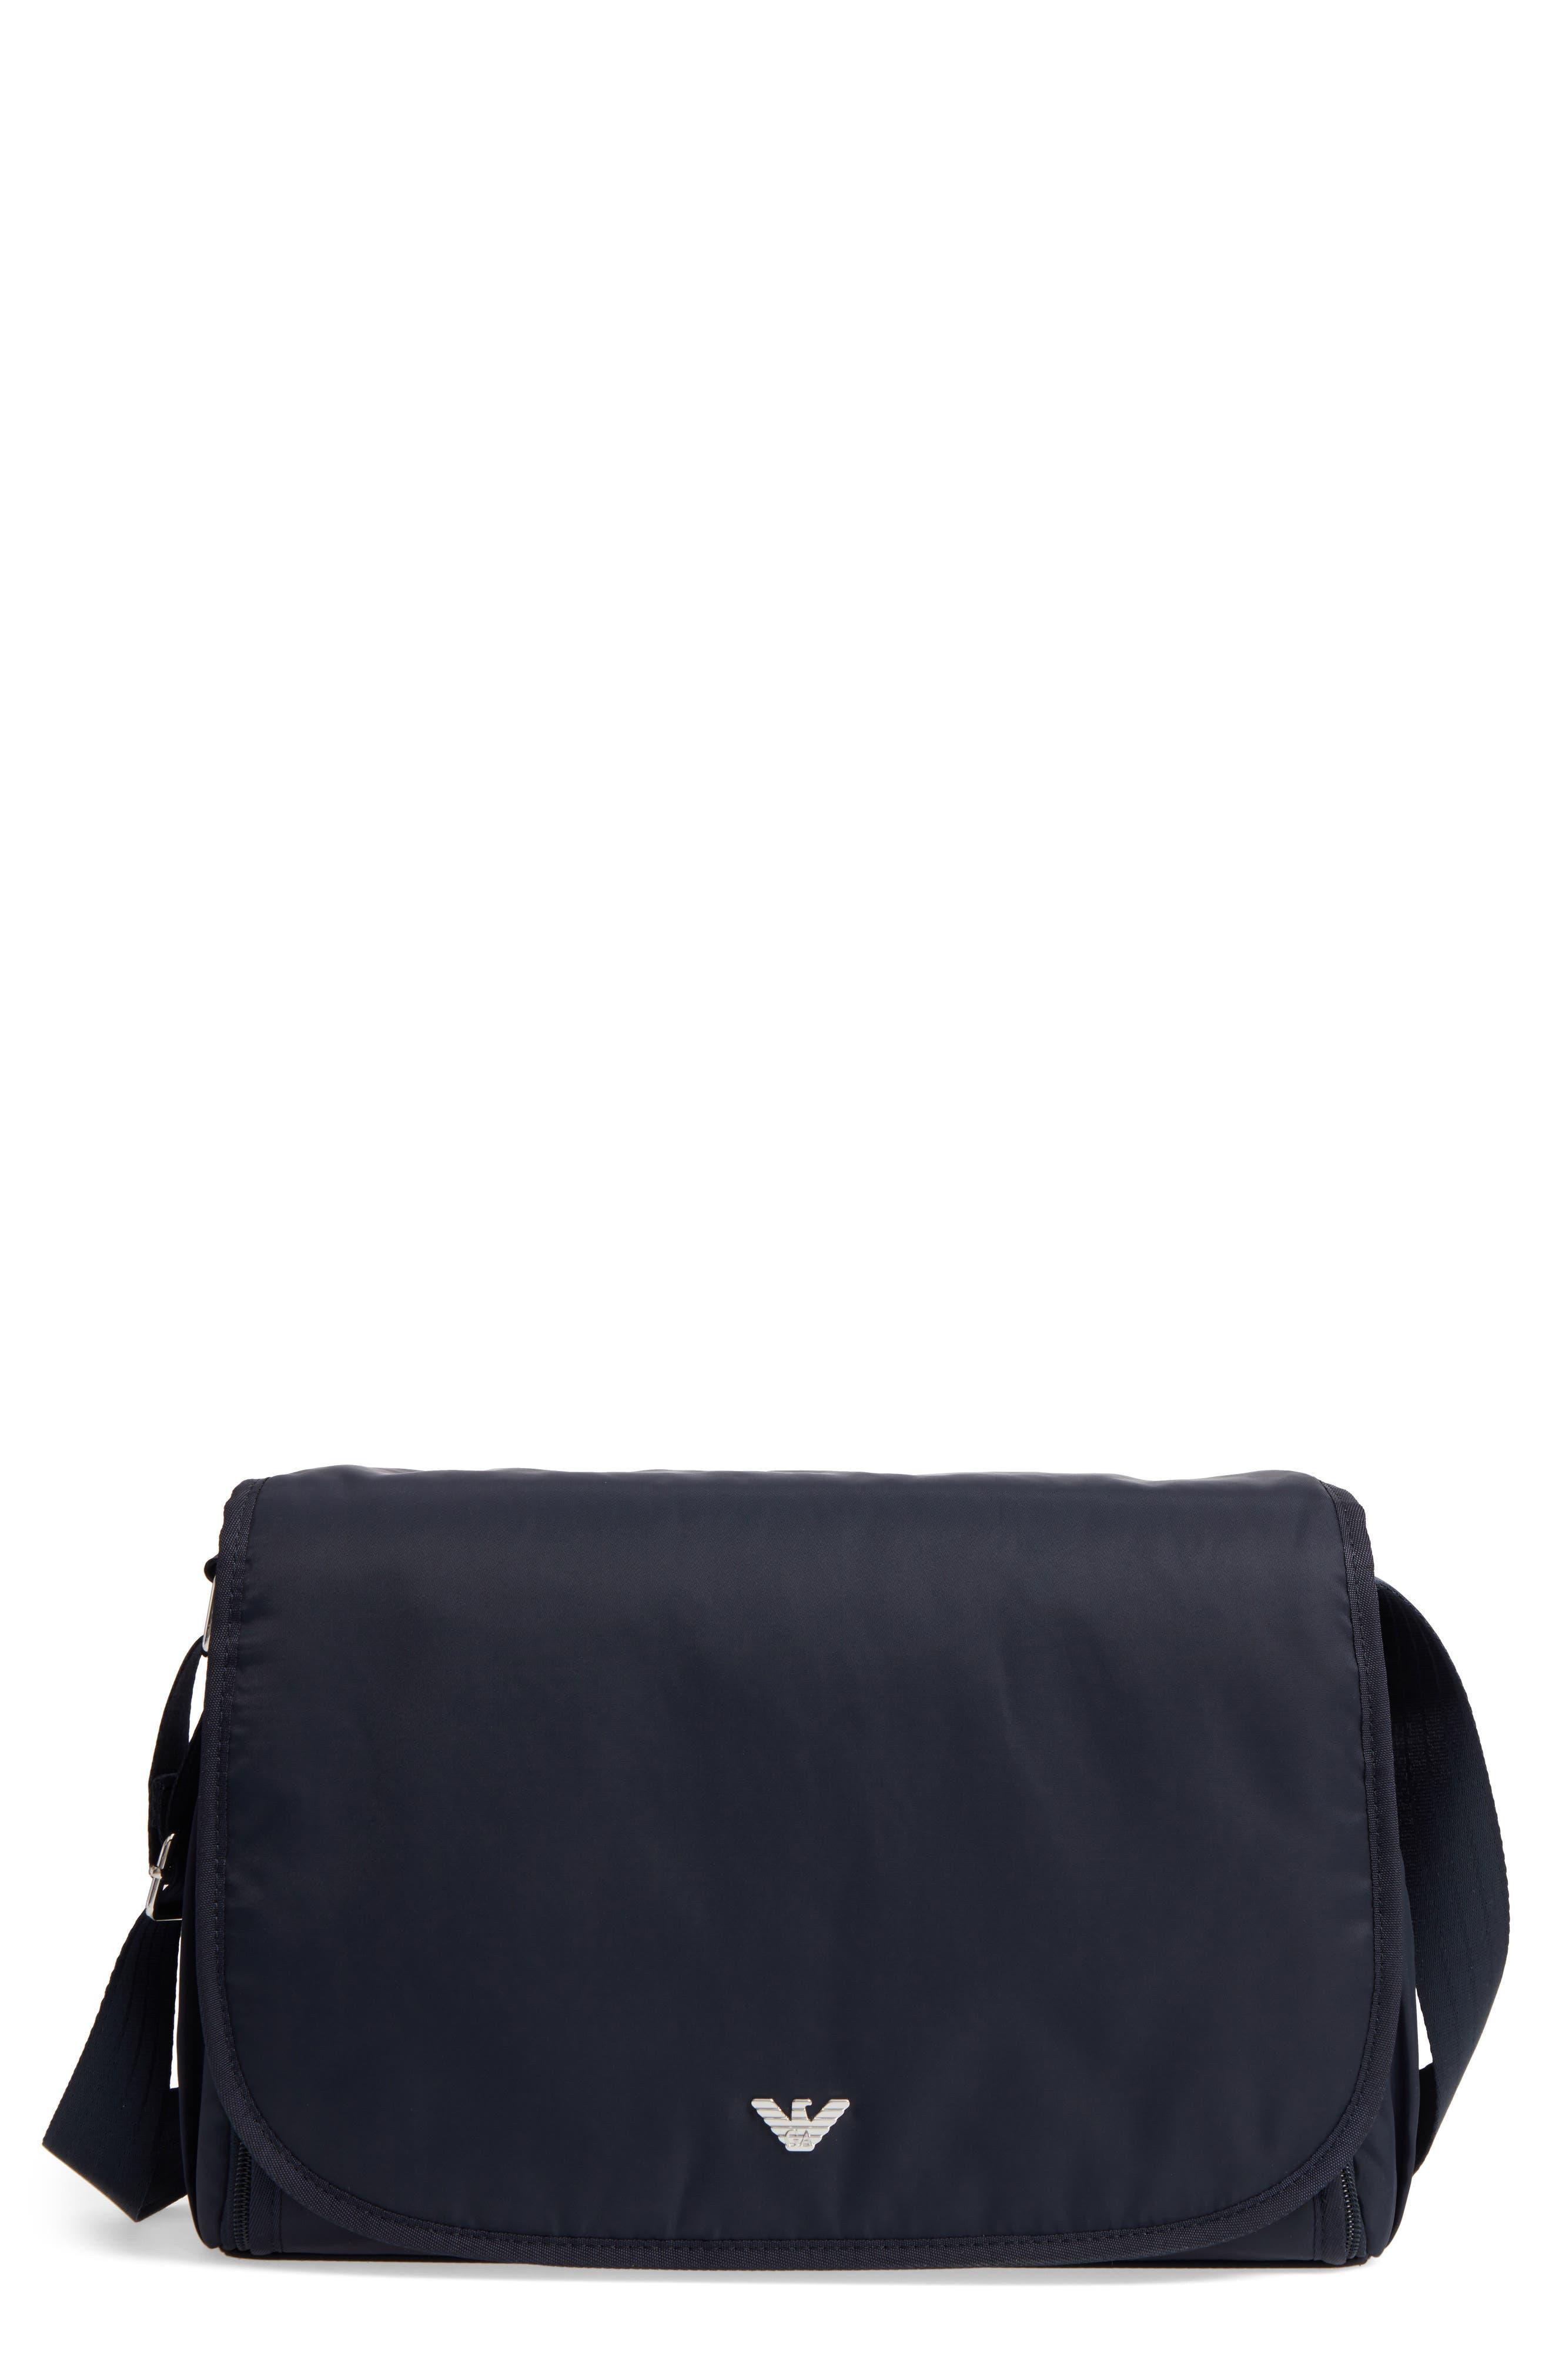 Nylon Messenger Diaper Bag,                             Main thumbnail 2, color,